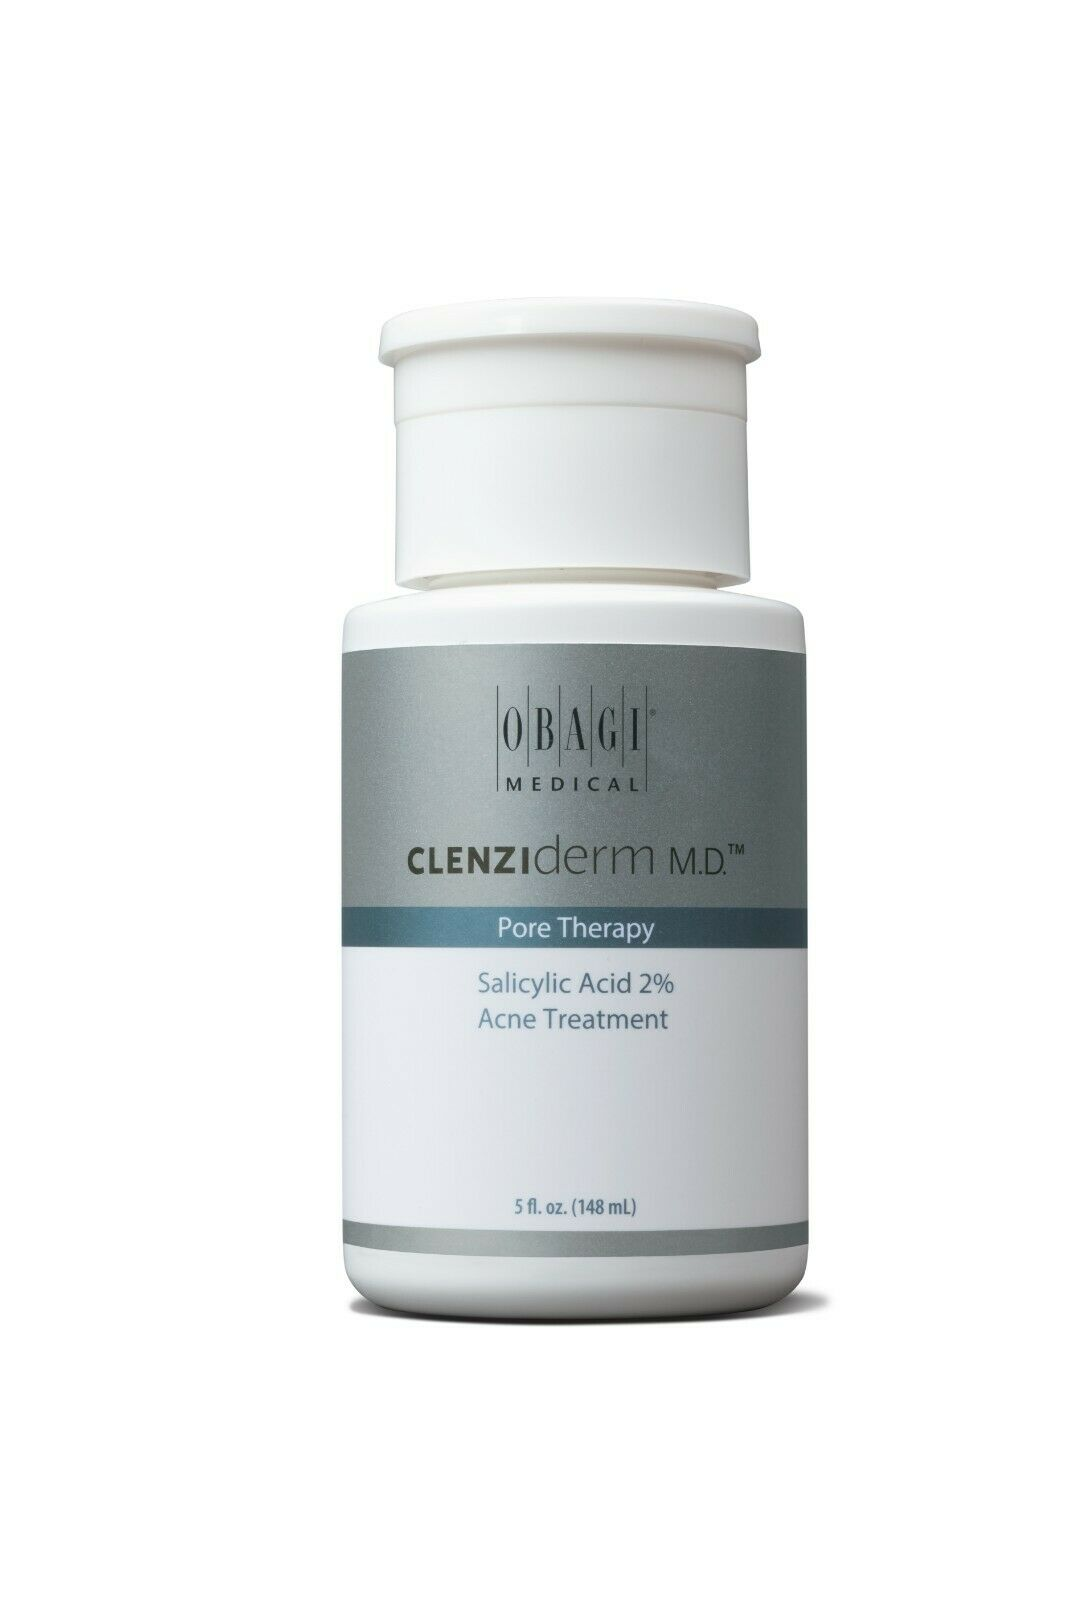 Obagi Clenziderm MD Pore Therapy Salicylic Acid 2% Acne Trea